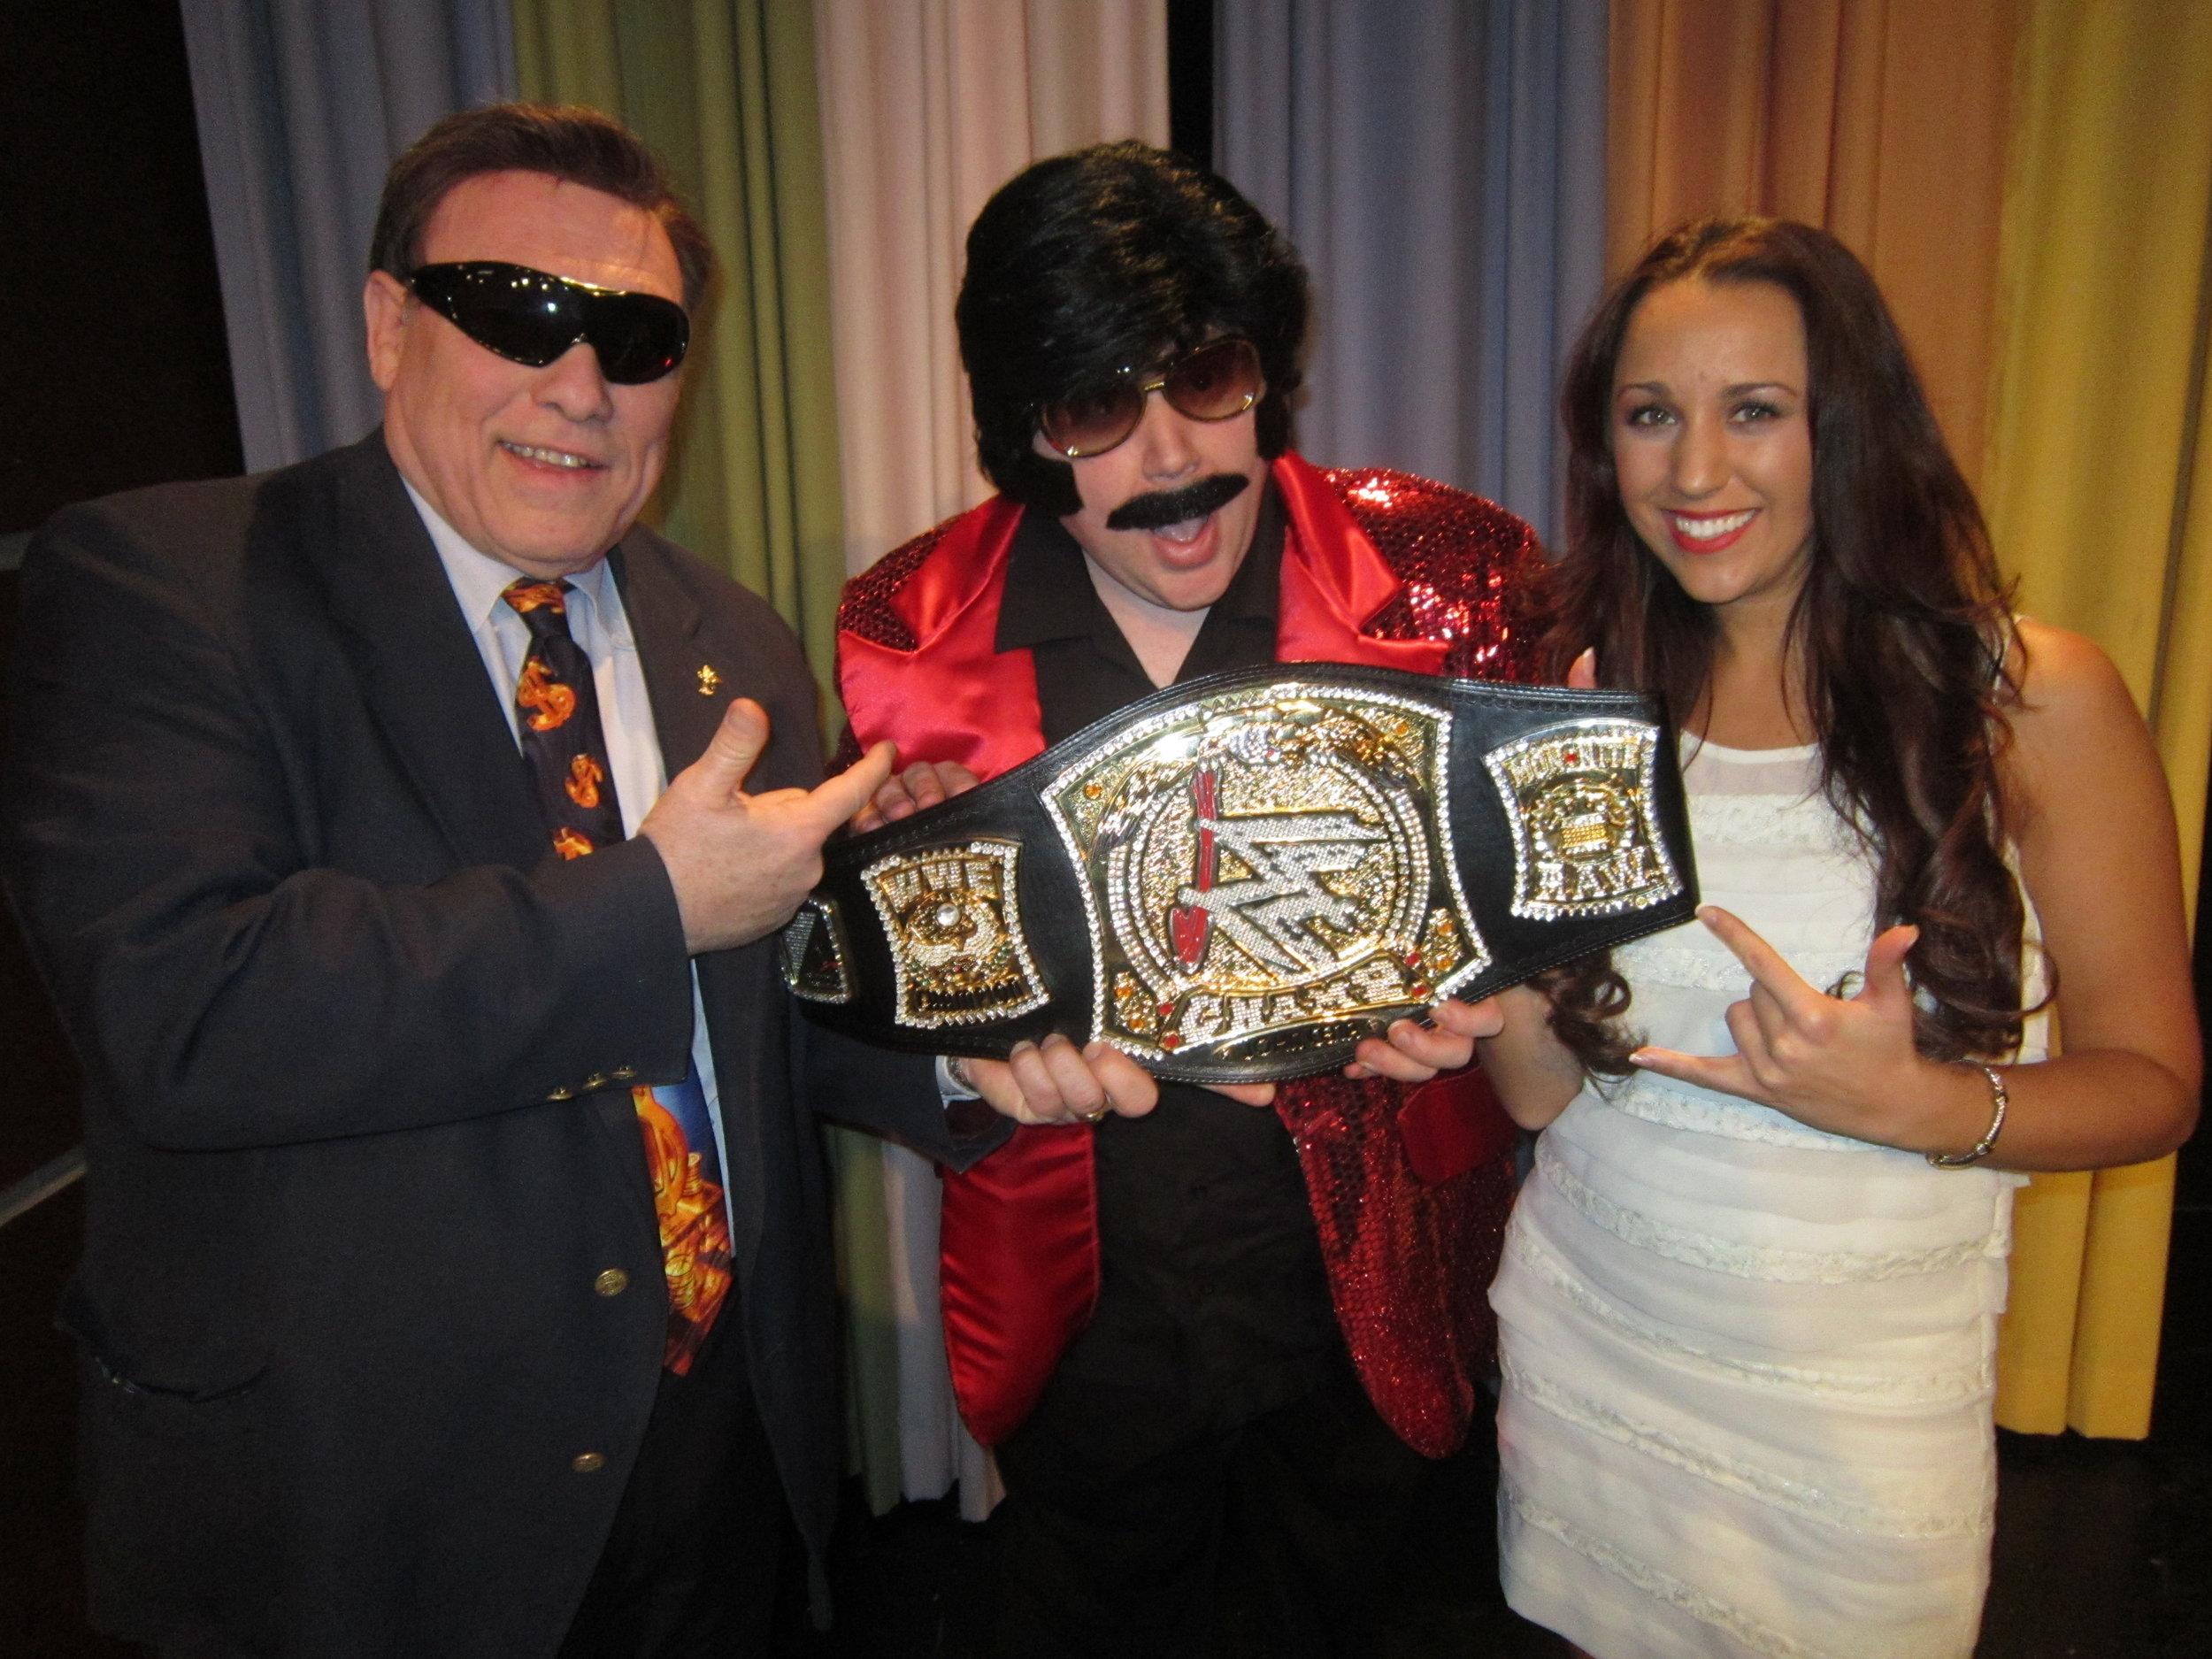 John Cena Sr., TC and Sabrina